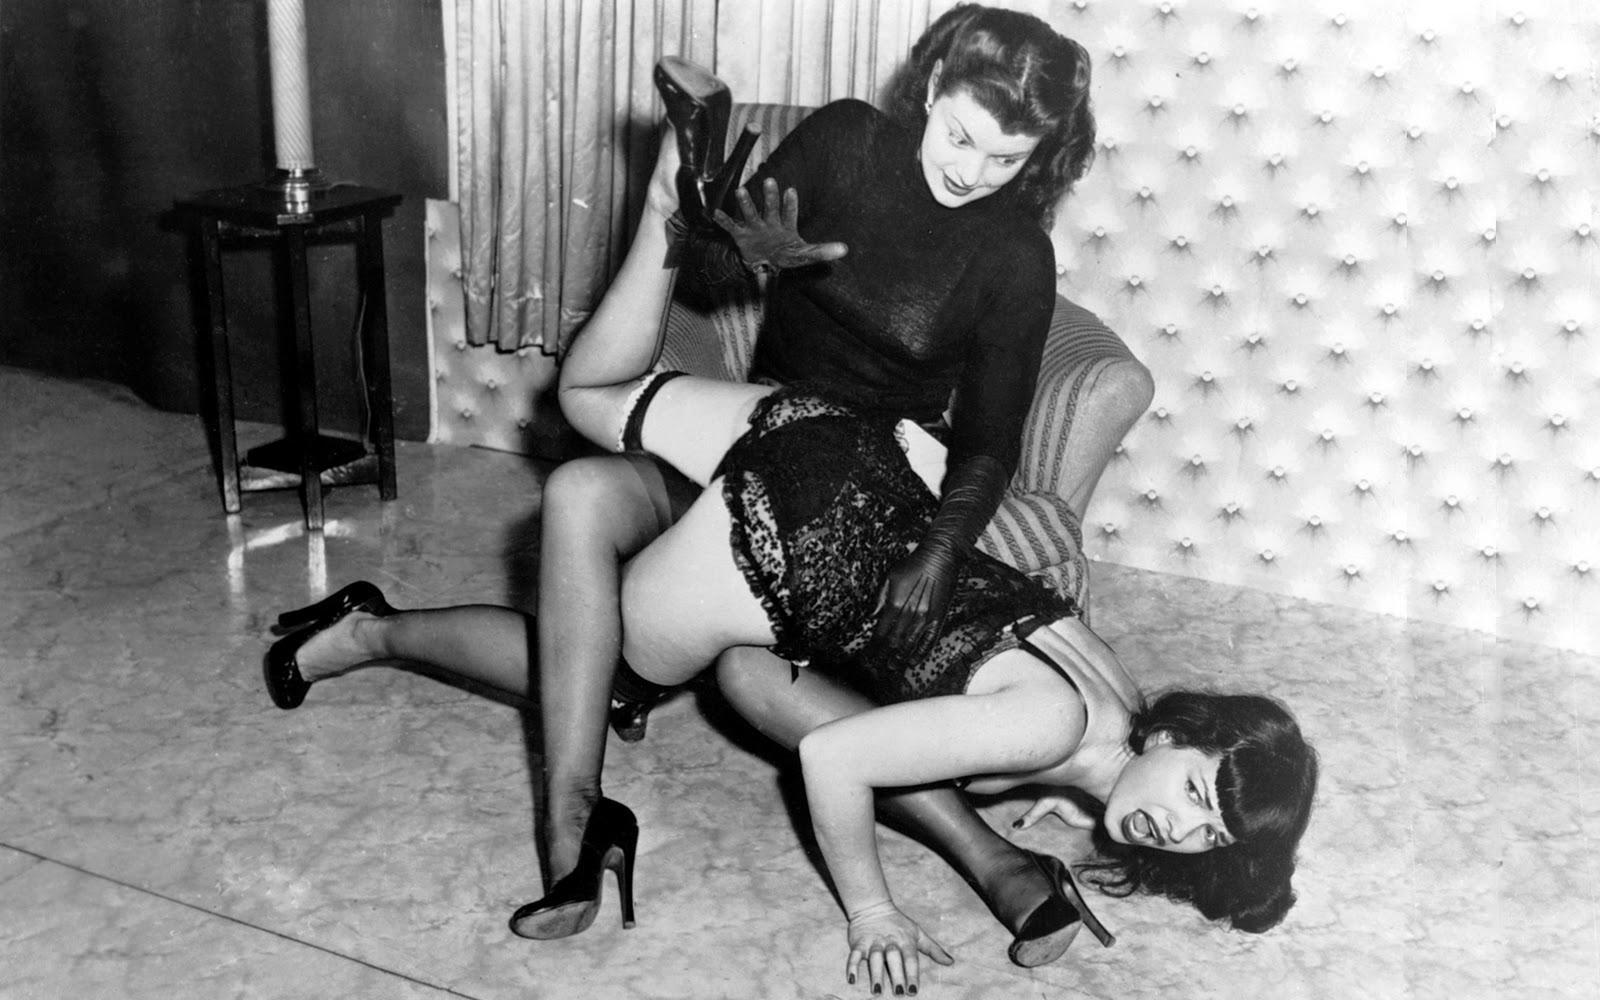 Girl tries ejaculating dildo